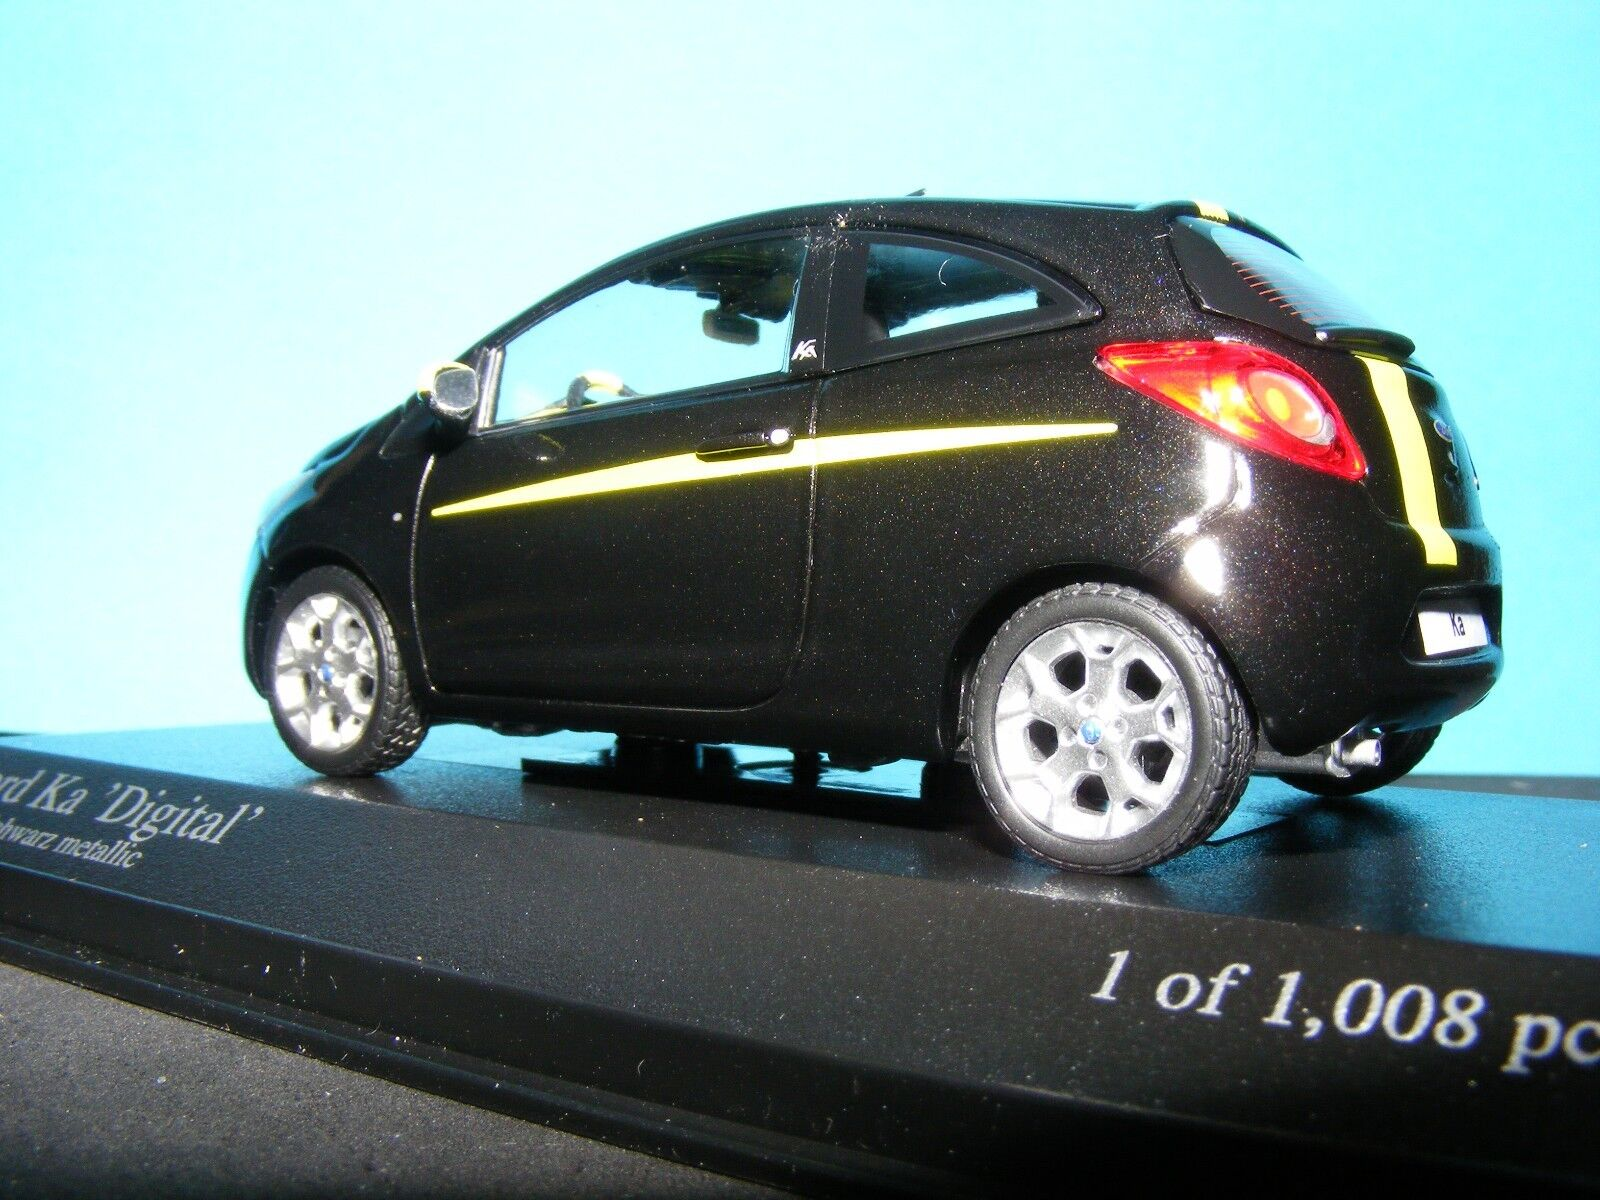 Ford Ford Ford Ka digital en Luminoso Amarillo Negro Metálico 2009 1 43RD. Minichamp Modelo c585c3